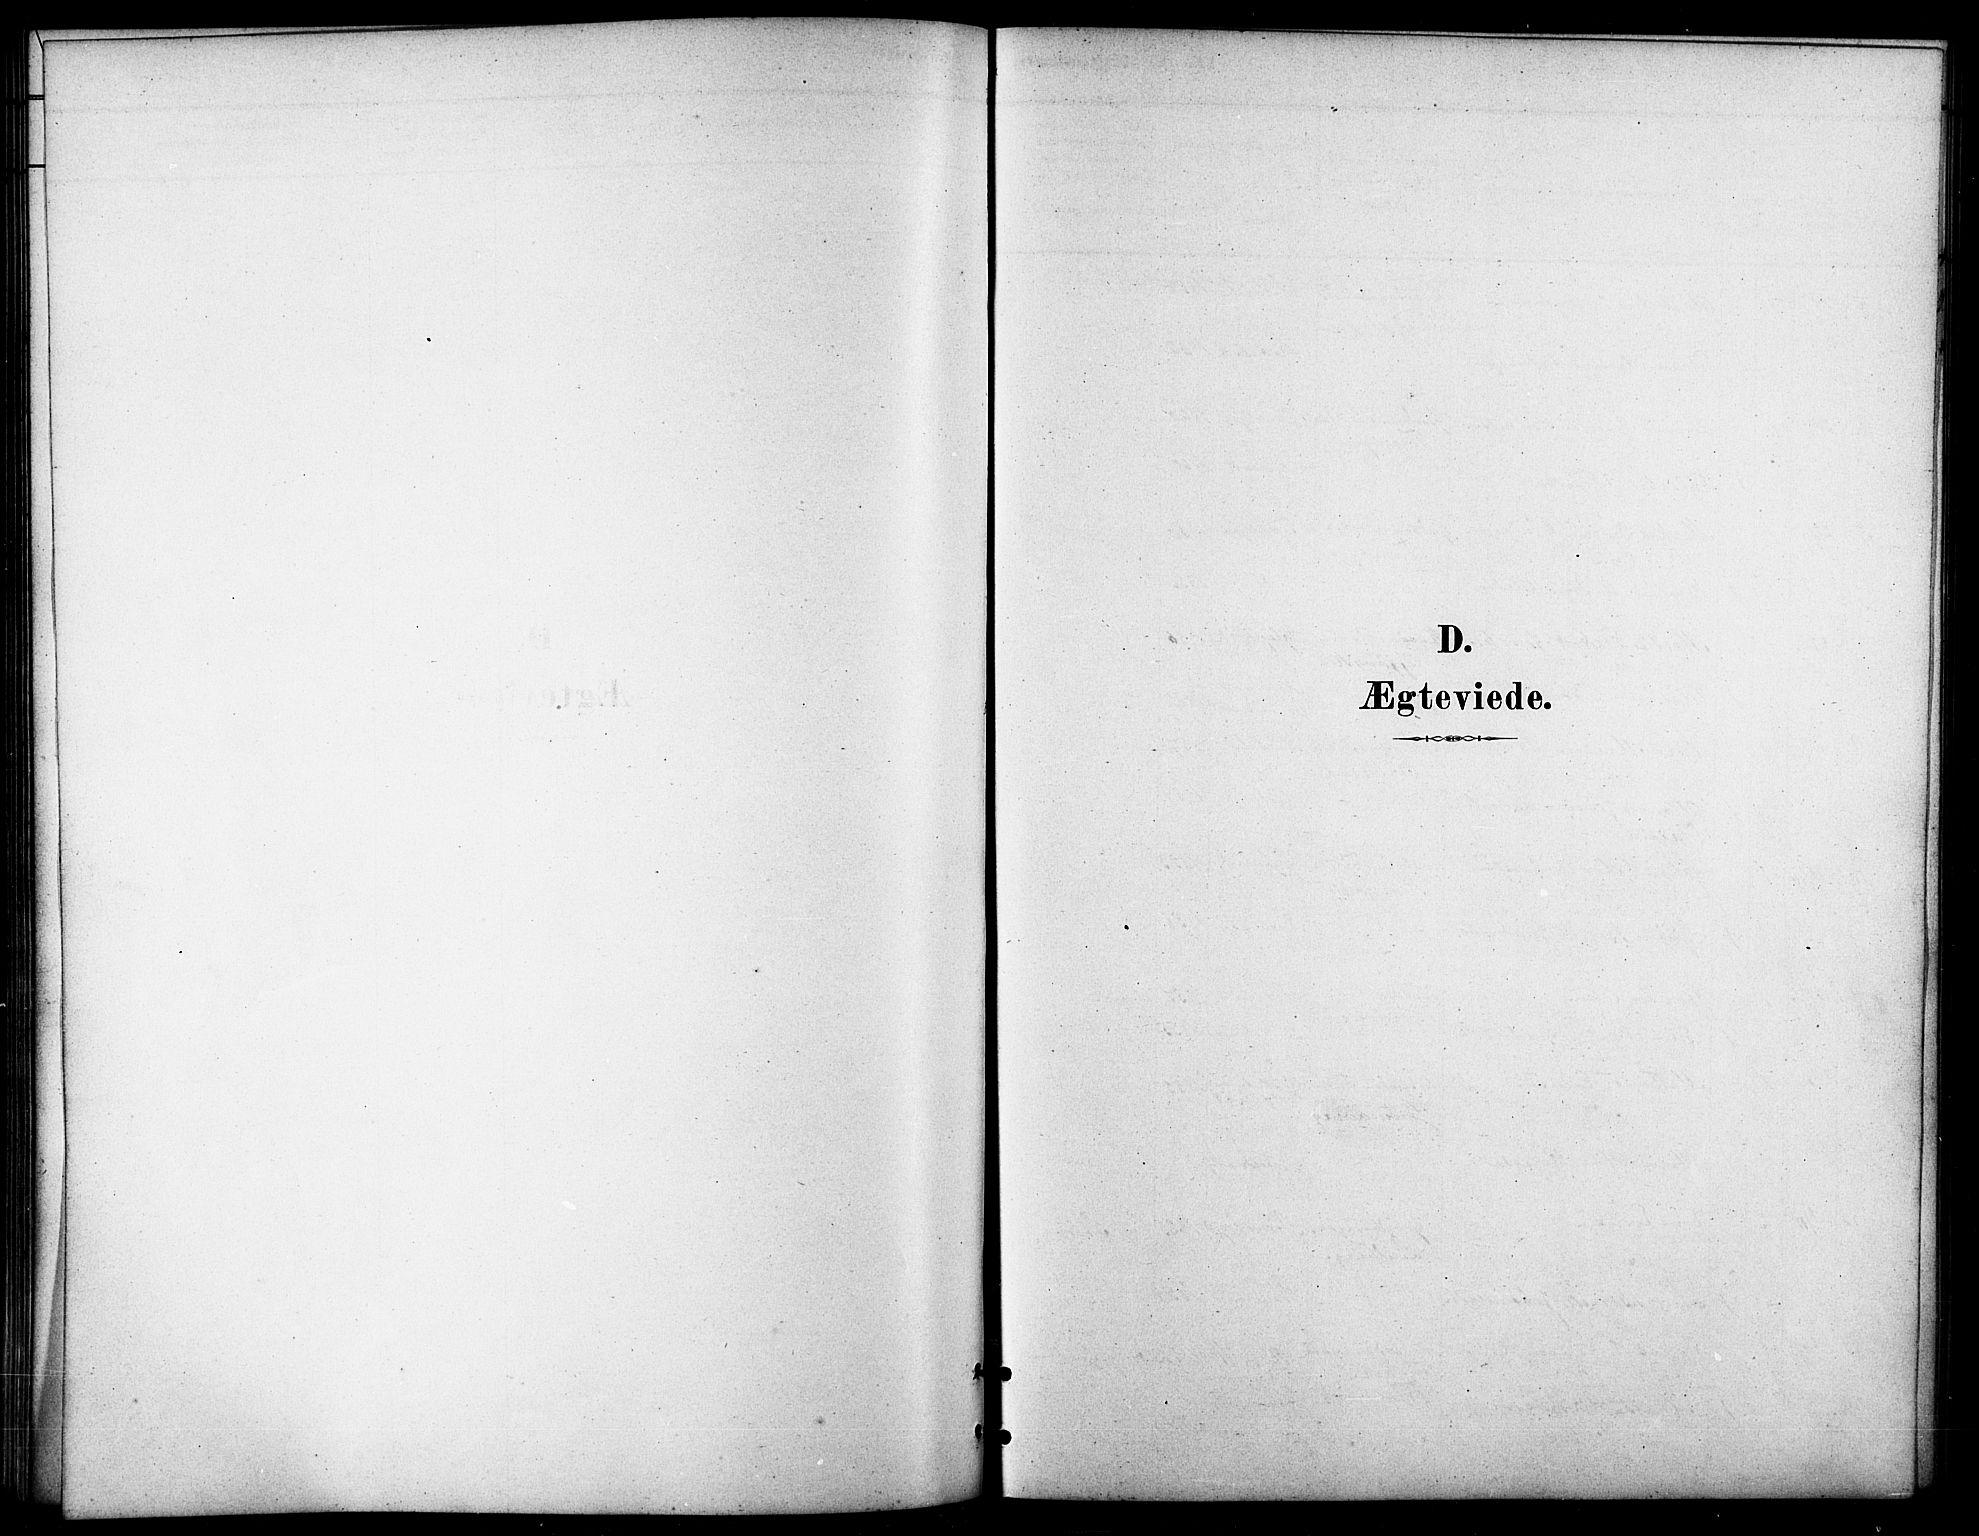 SATØ, Lenvik sokneprestembete, H/Ha: Ministerialbok nr. 11, 1880-1889